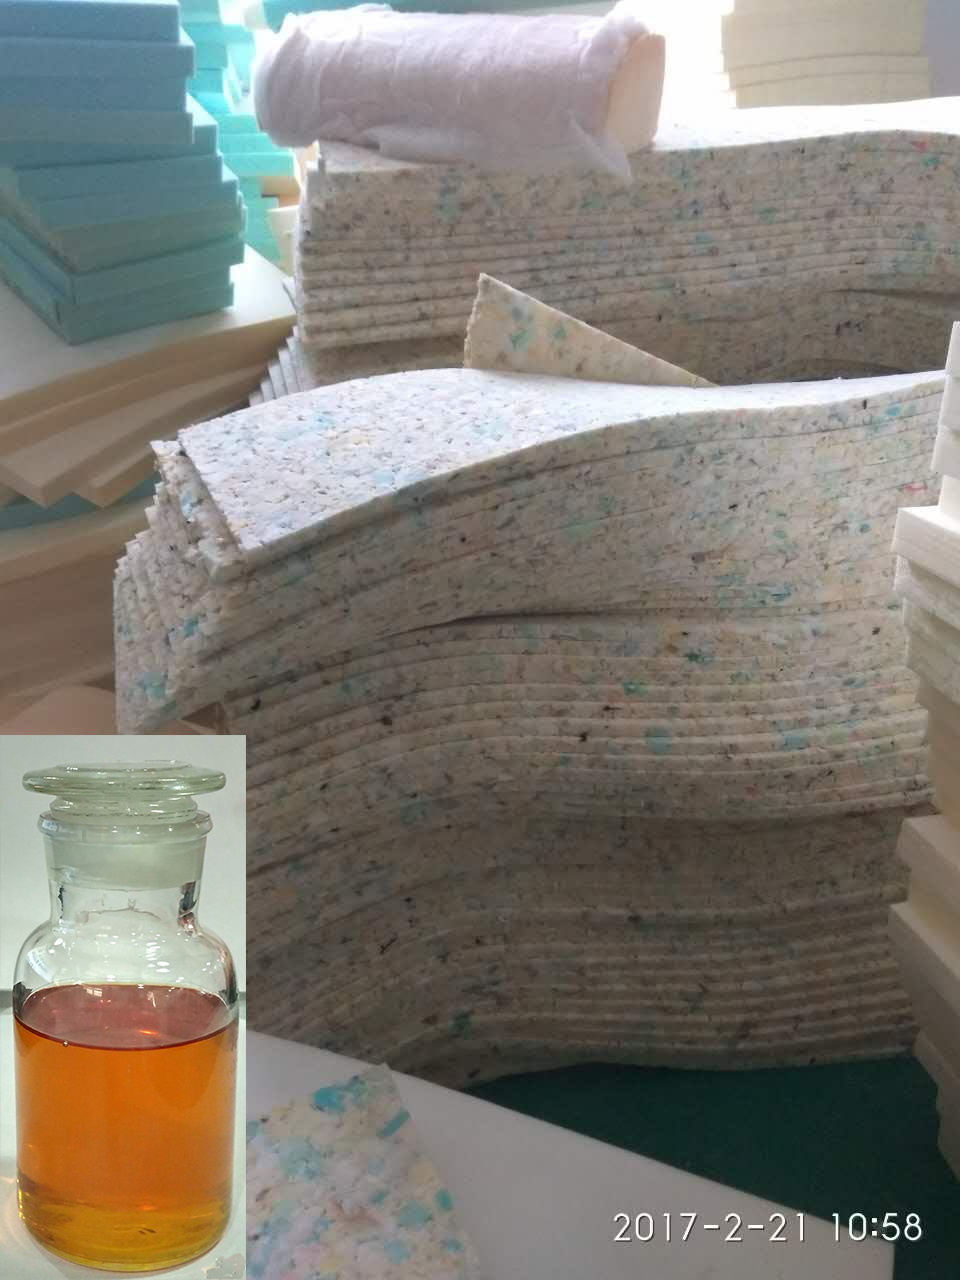 China Supplier GBL Hot Sale Liquid Chemical Polyurethane Adhesive